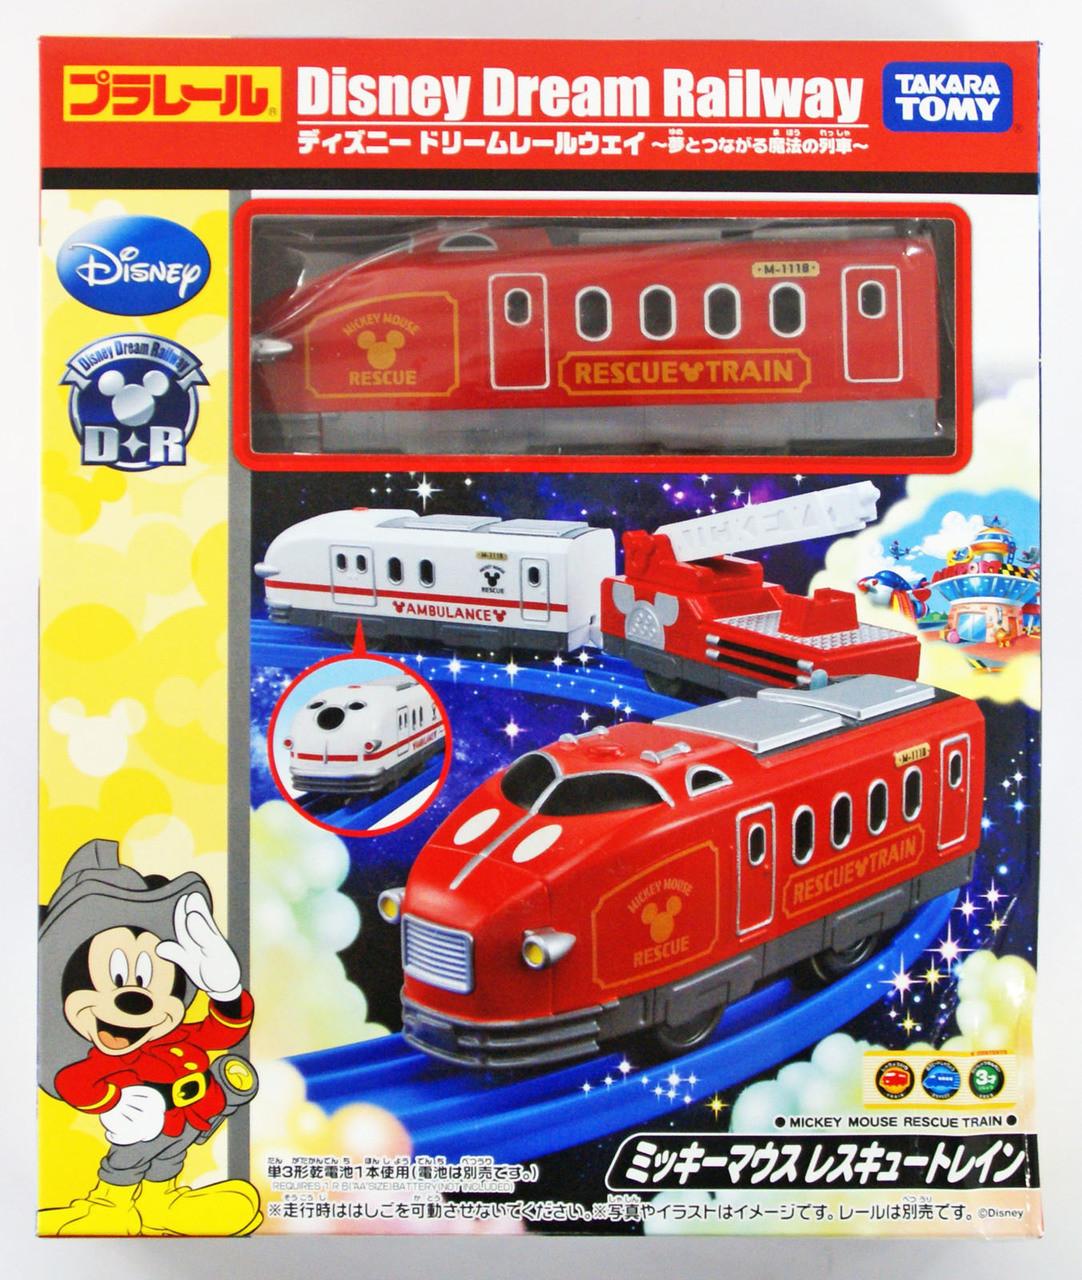 Takara Tomy Pla Rail Plarail Disney Dream Railway Mickey Mouse Rescue Train 863922 Plaza Japan